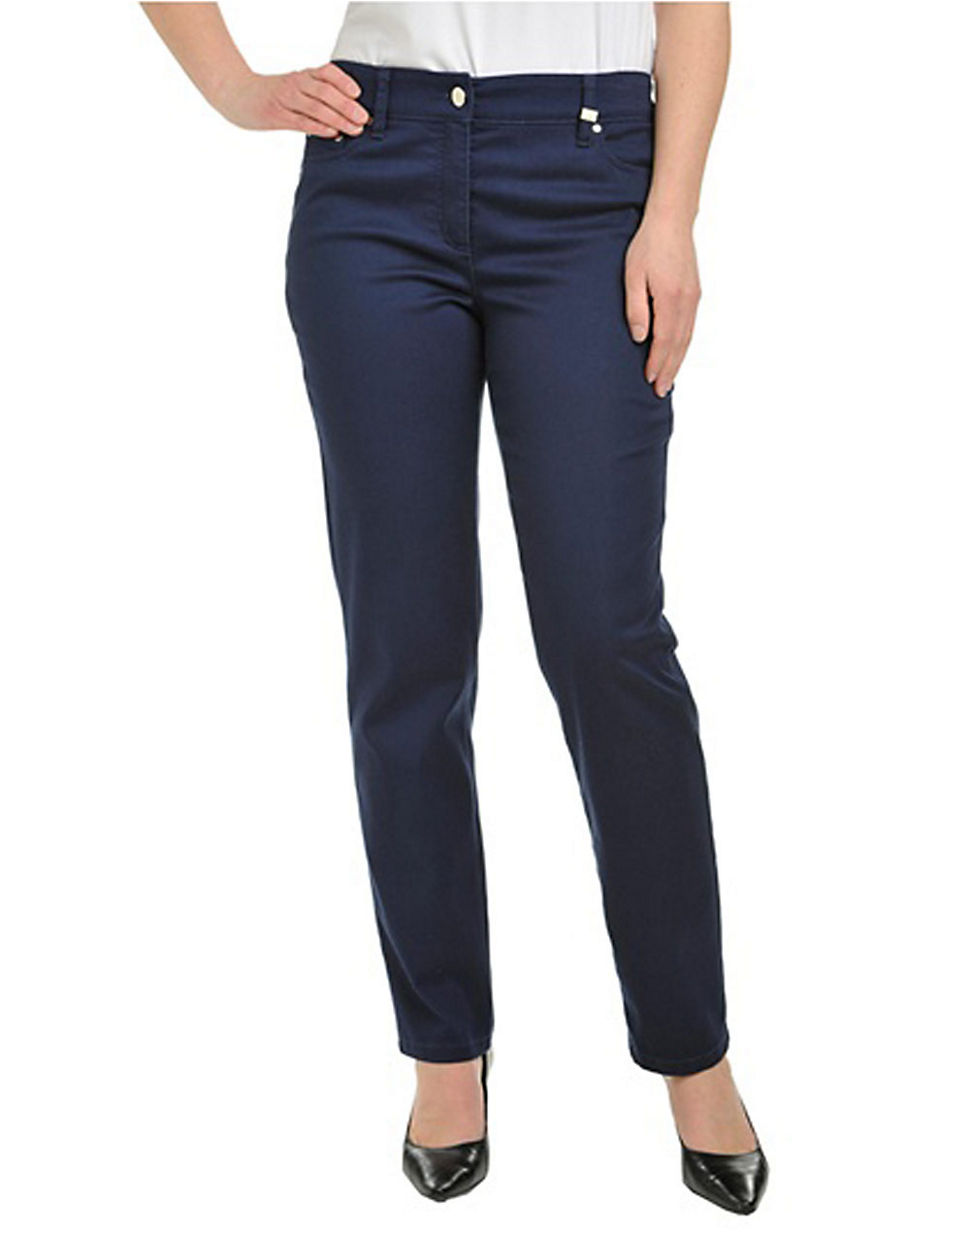 Plus Size Hug Jean 5 Pocket Pant blue 18 W